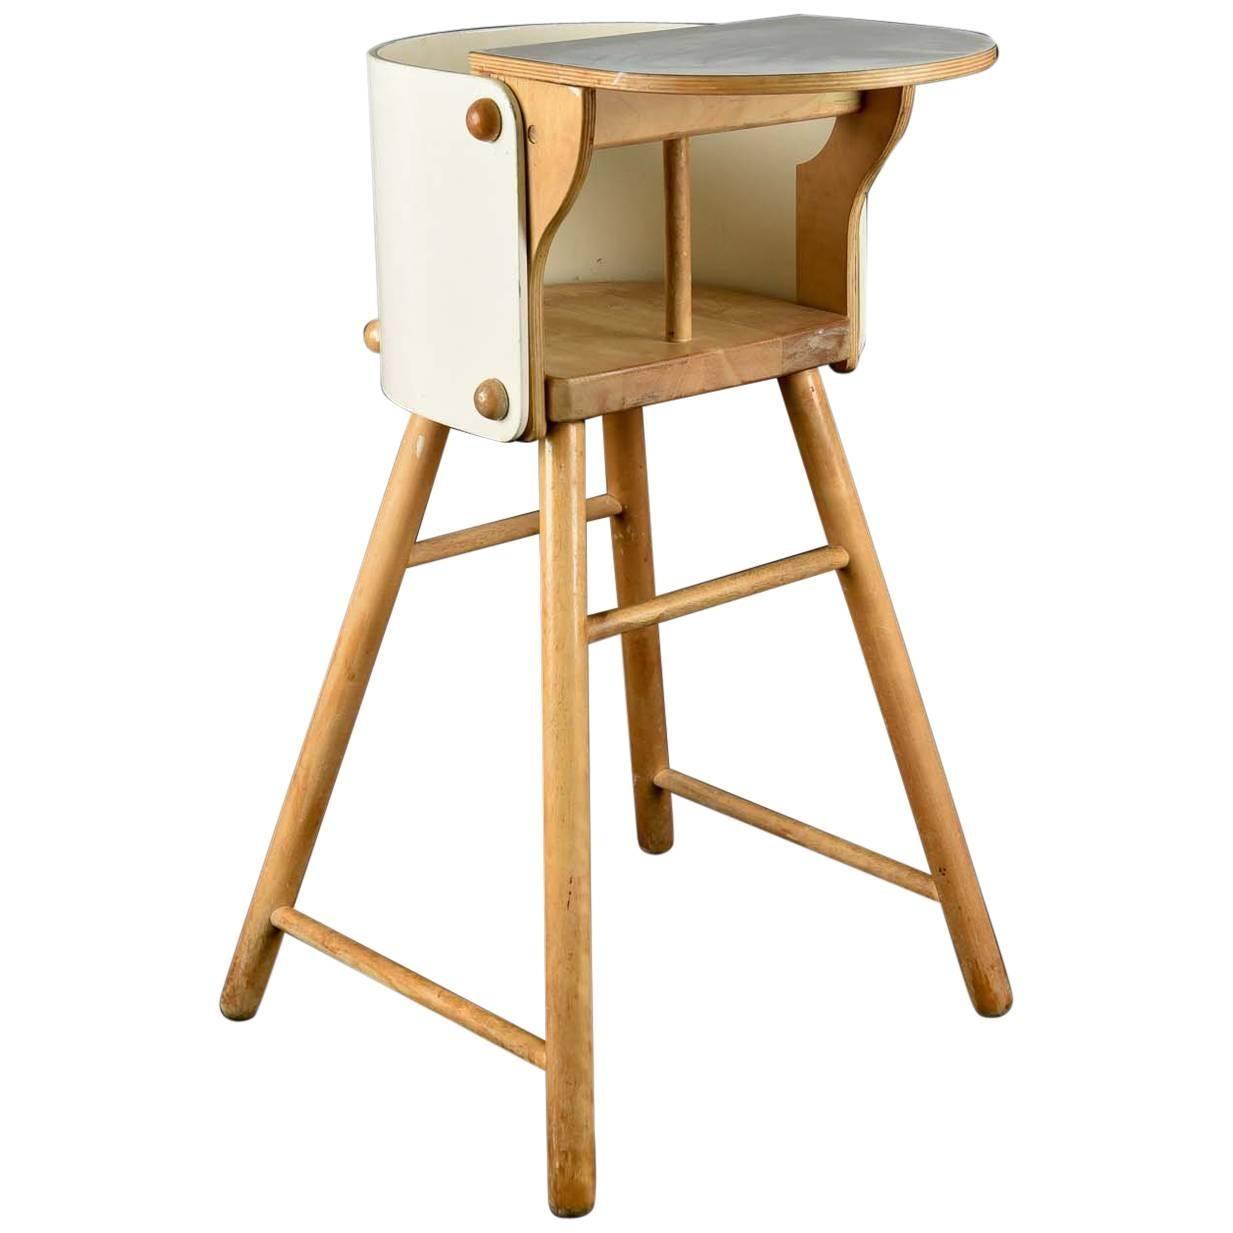 Exceptionnel Ben Af Schulten For Artek Model 616 Childu0027s High Chair, 1960s